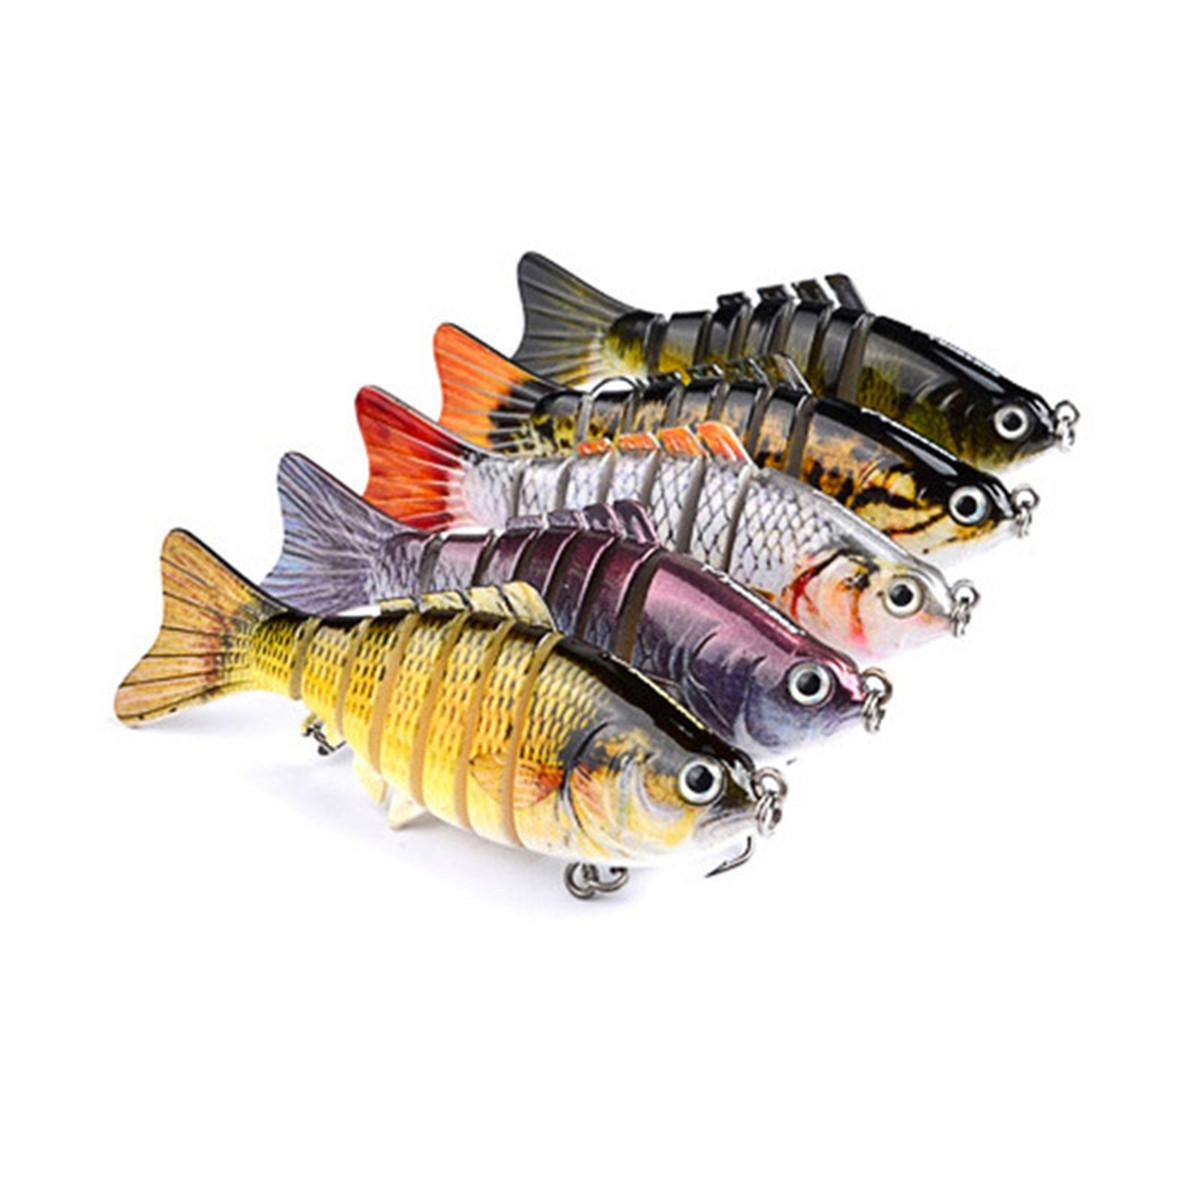 Fishing Lures Wobblers Swimbait Crankbait Hard Bait Isca Artificial Fishing Tackle Lifelike Lure 7 Segment 10cm 15.5g